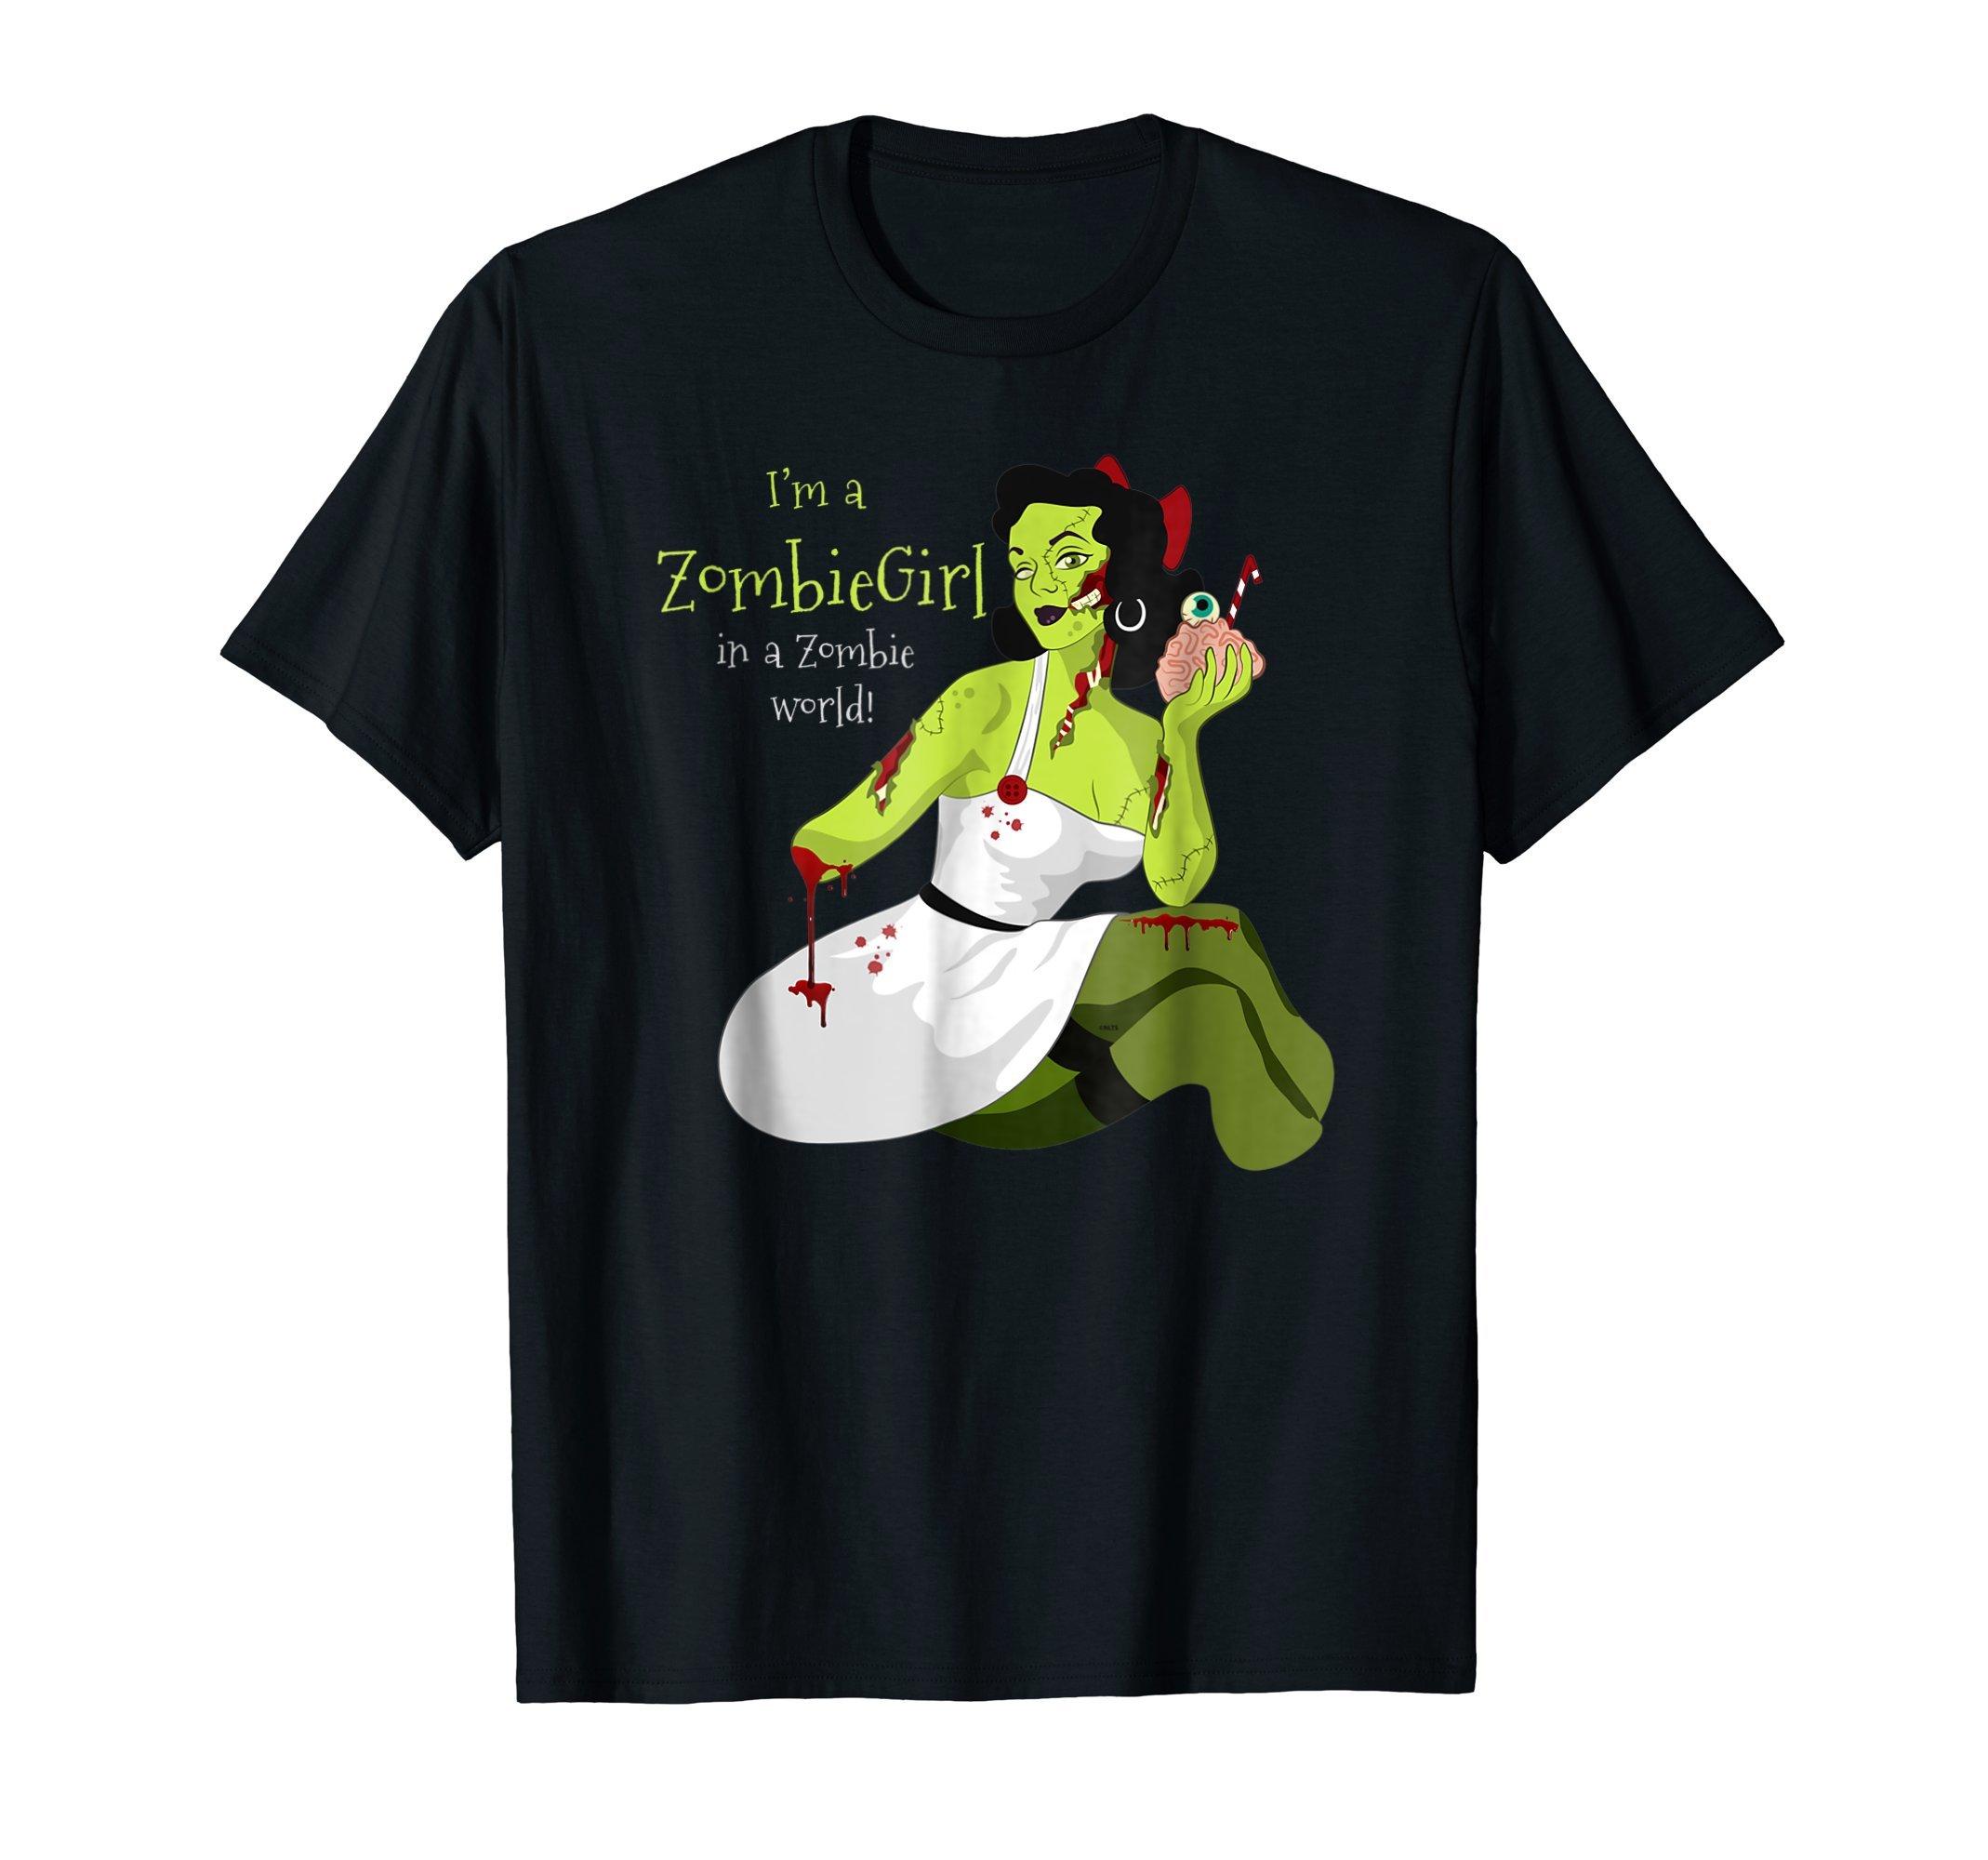 Im-a-Zombie-Girl-Halloween-costume-T-Shirt-Tee-Gift